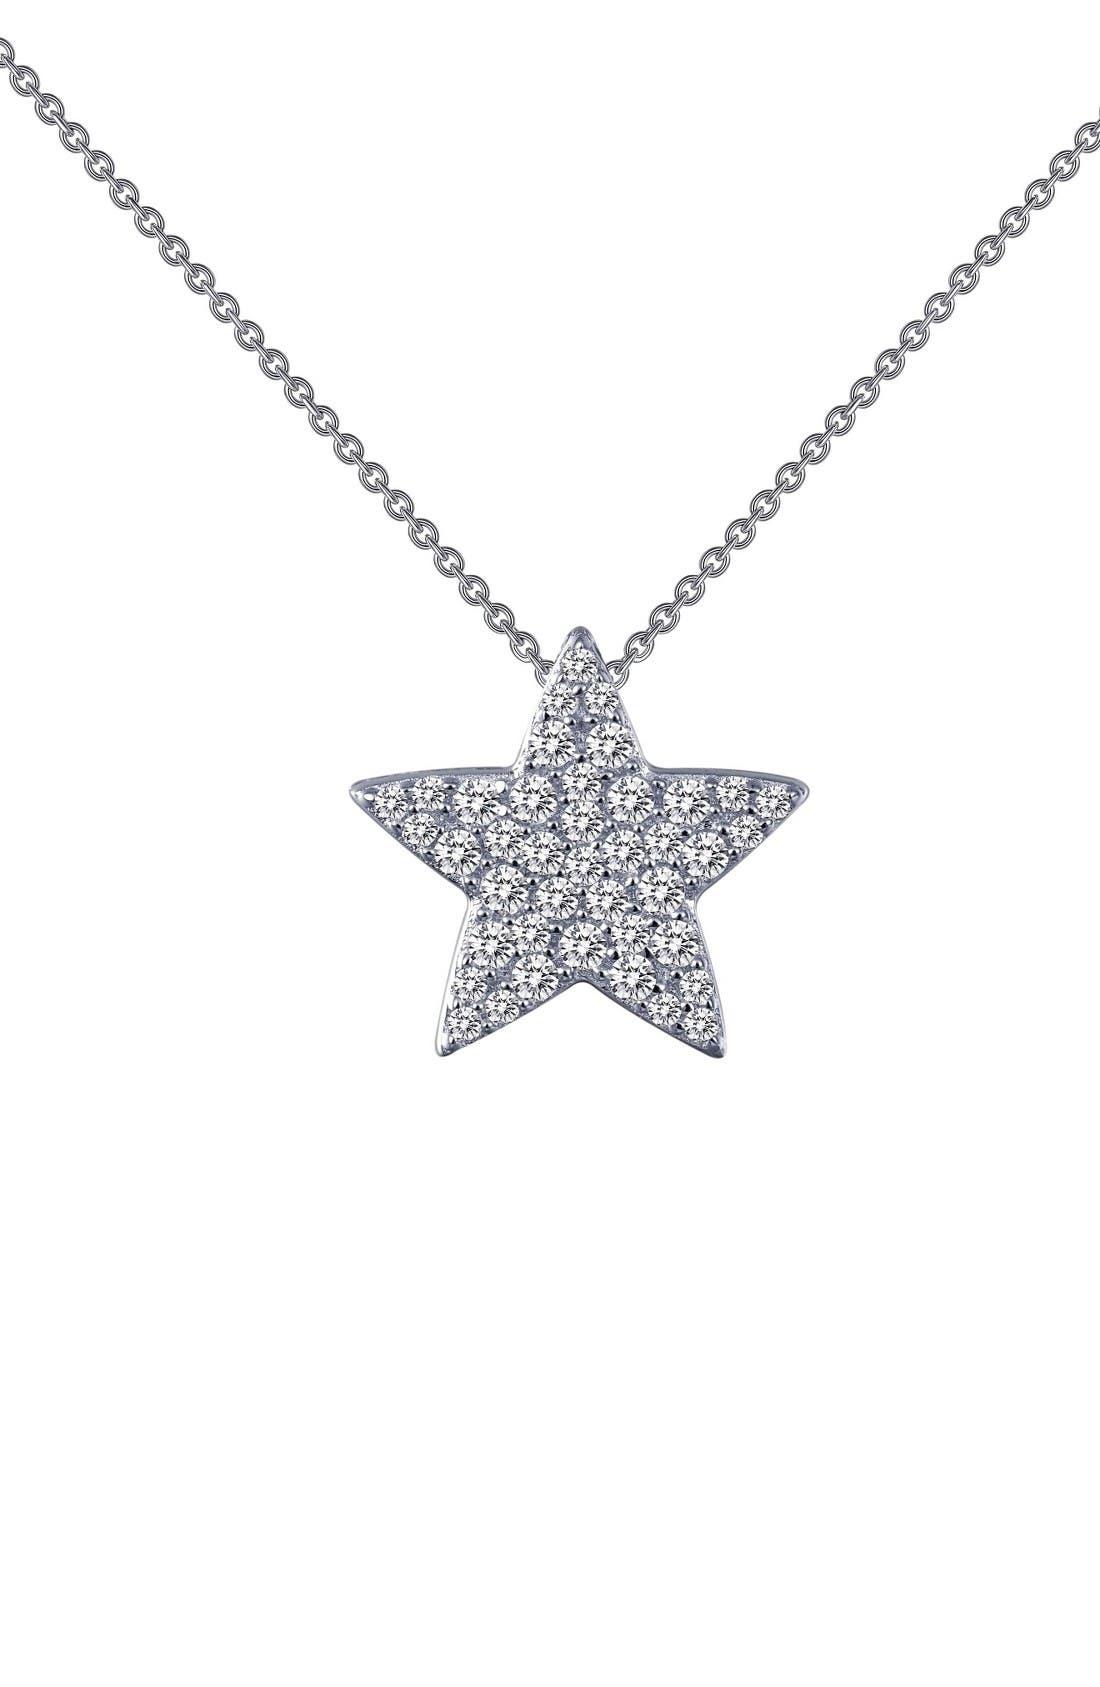 LAFONN Simulated Diamond Star Pendant Necklace